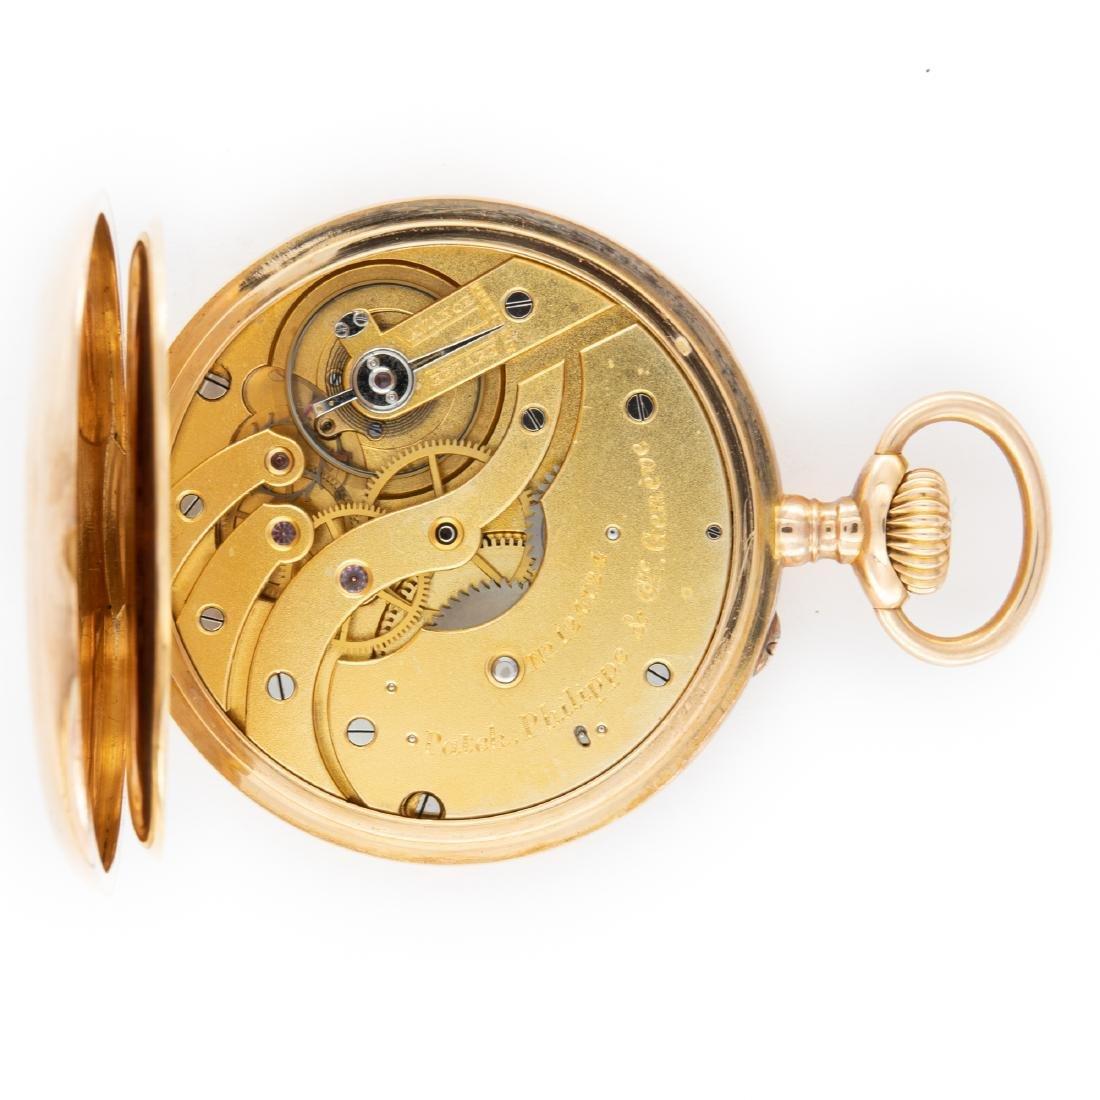 GOLD PATEK PHILIPPE POCKET WATCH, CIRCA1905 - 4